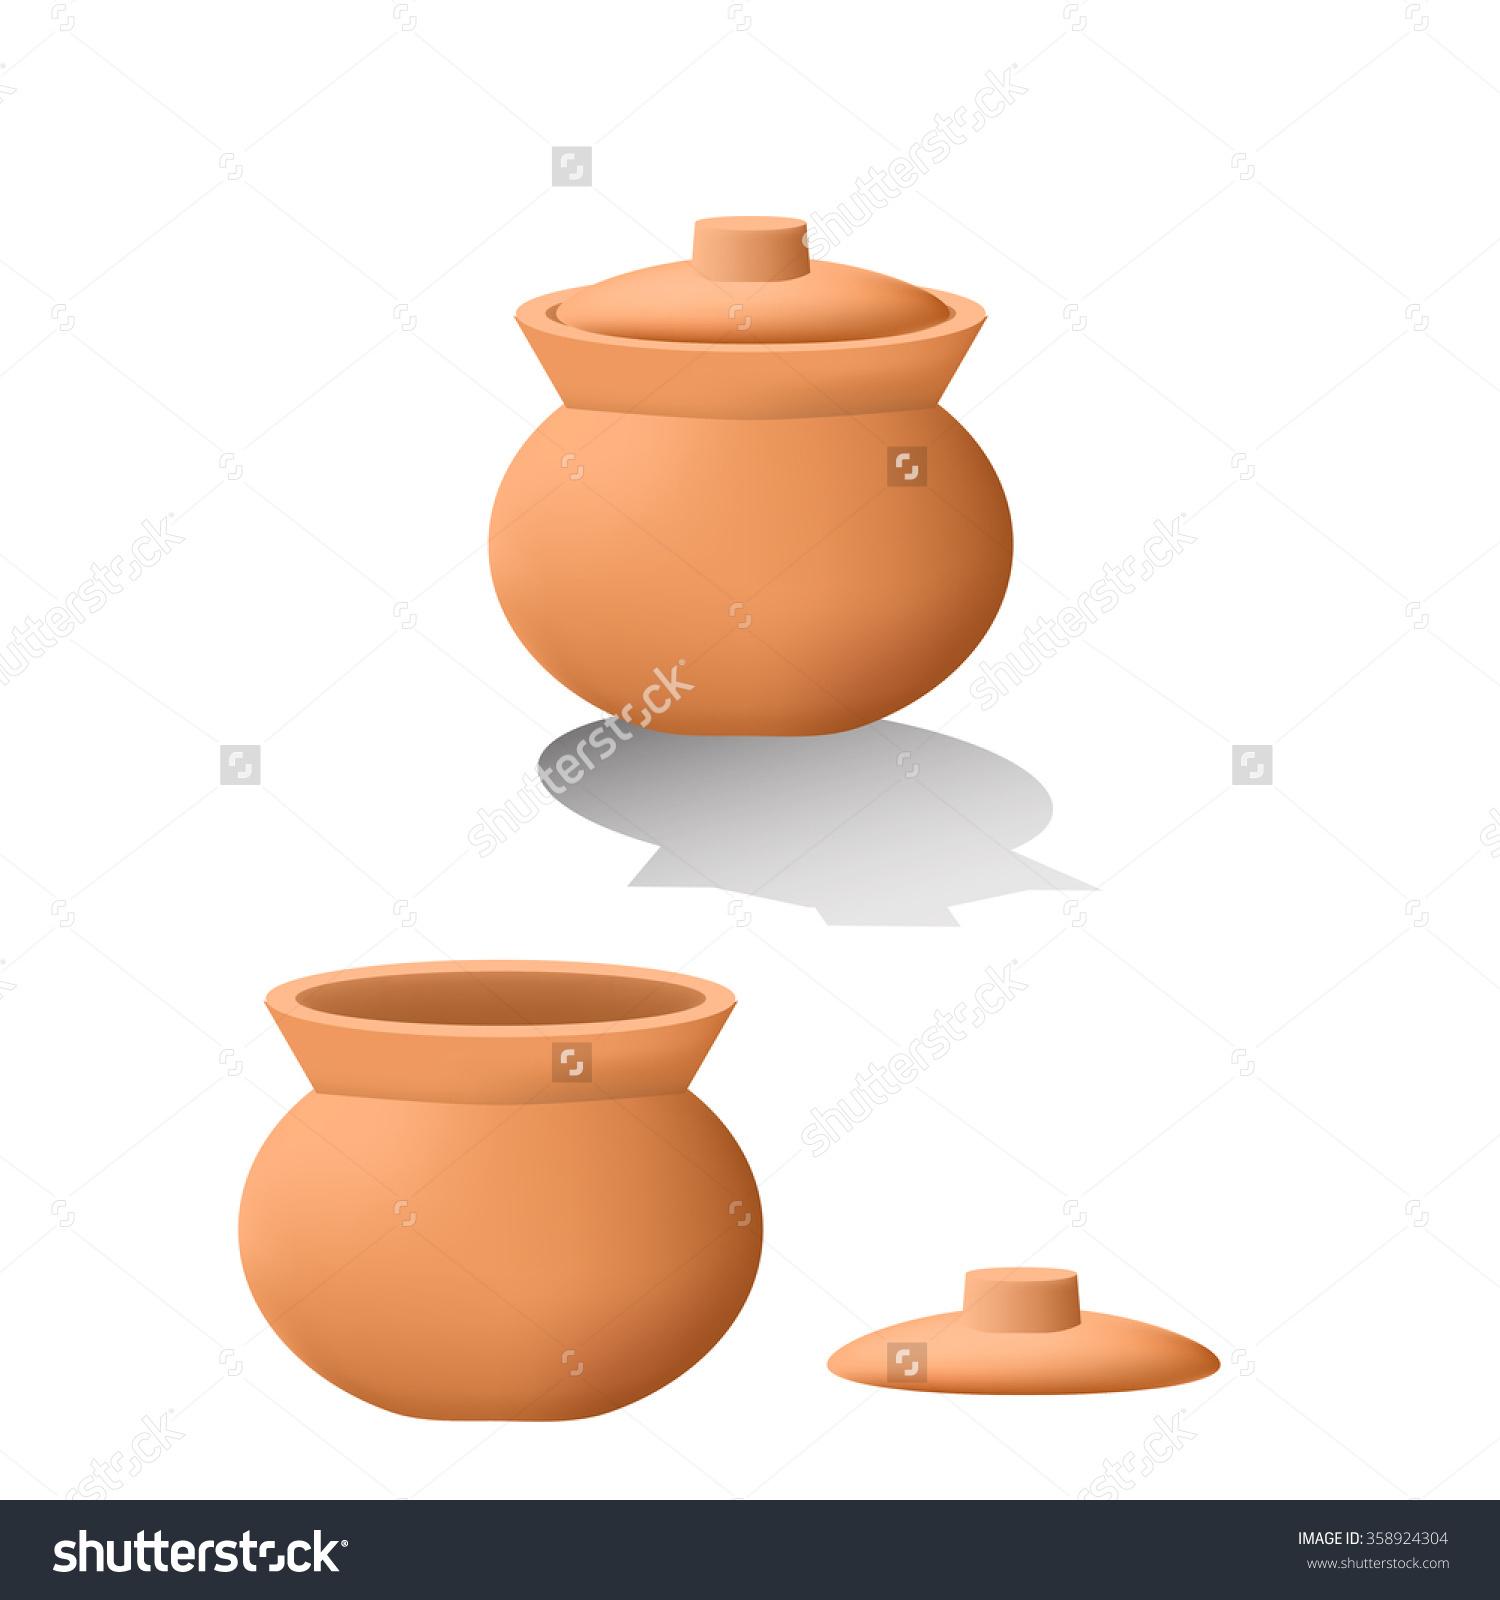 Traditional Asian Clay Pot 3d Mesh Stock Vector 358924304.